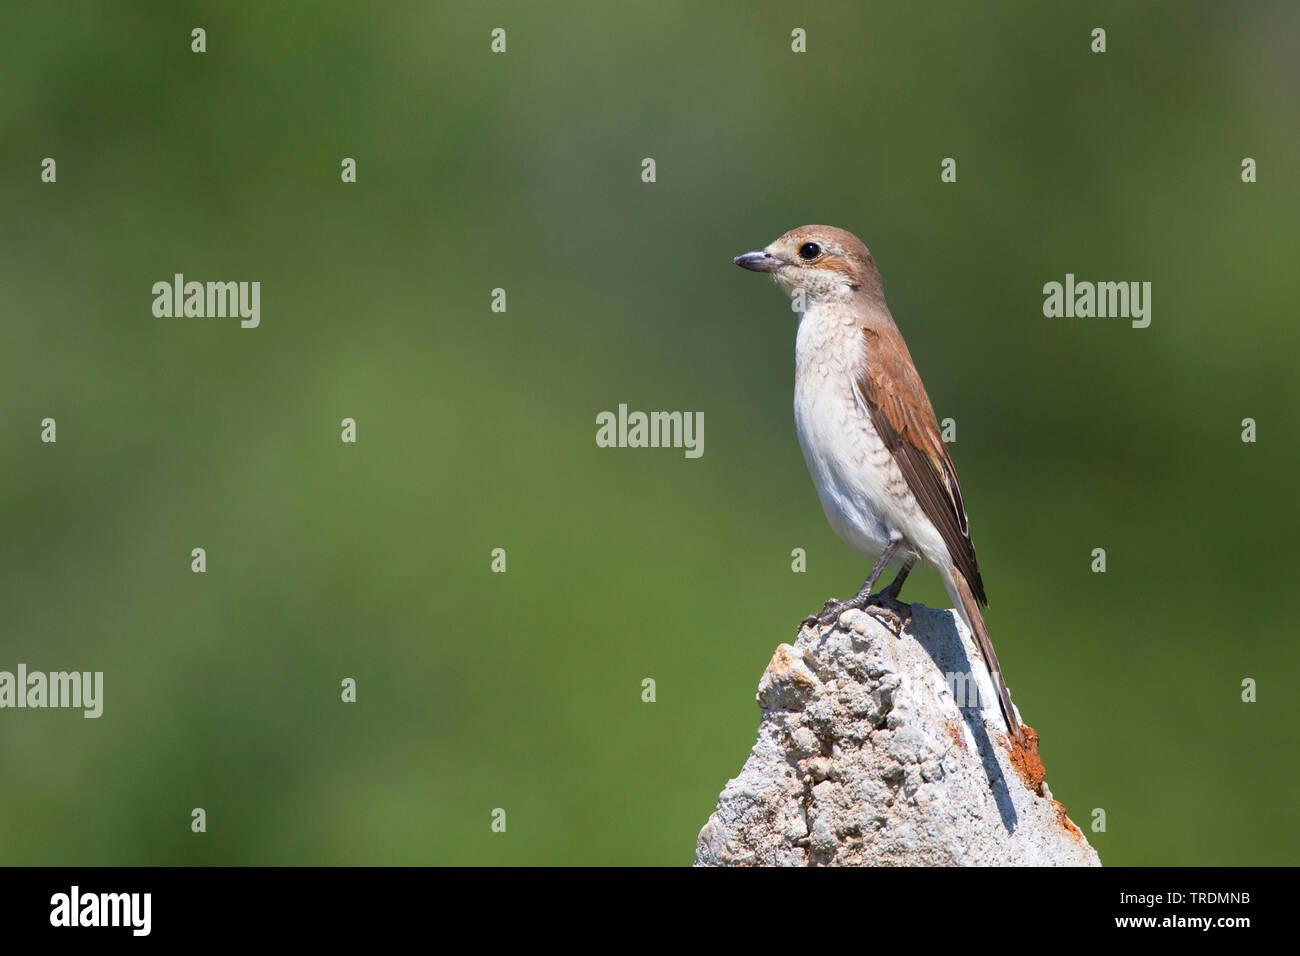 red-backed shrike (Lanius collurio), fe male on a post, Bulgaria - Stock Image